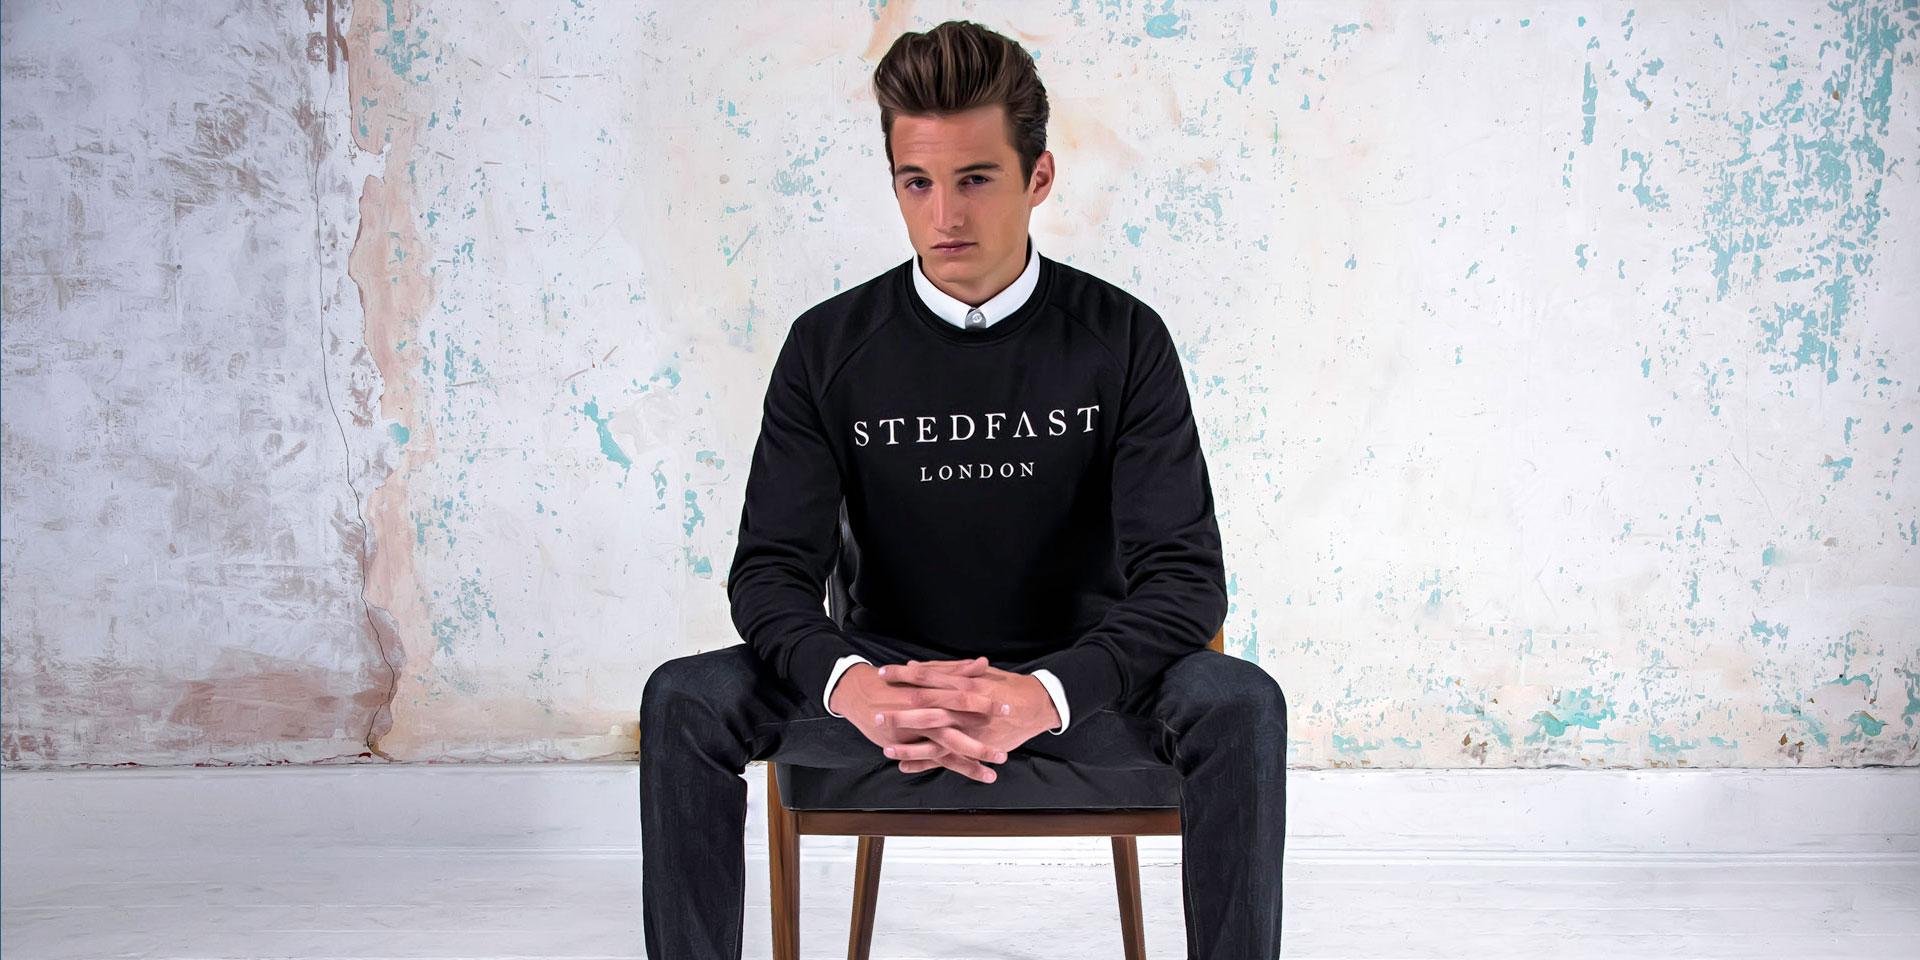 Stedfast London